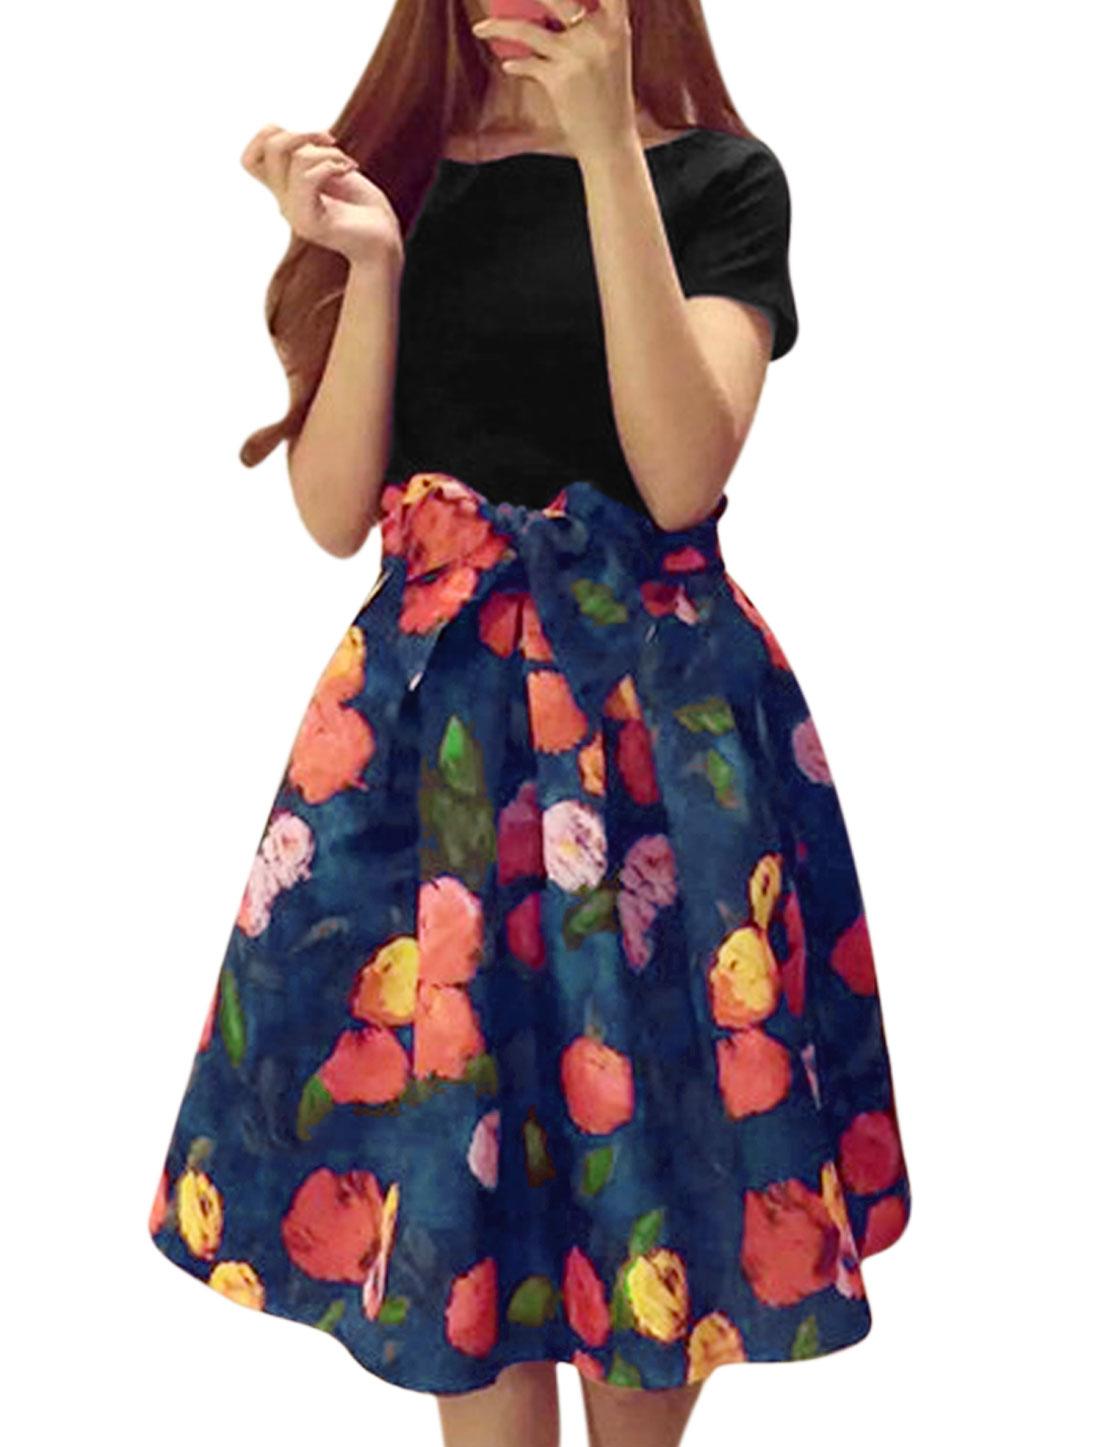 Women Short Sleeves T-Shirts w Floral Prints Full Skirts Black Blue M